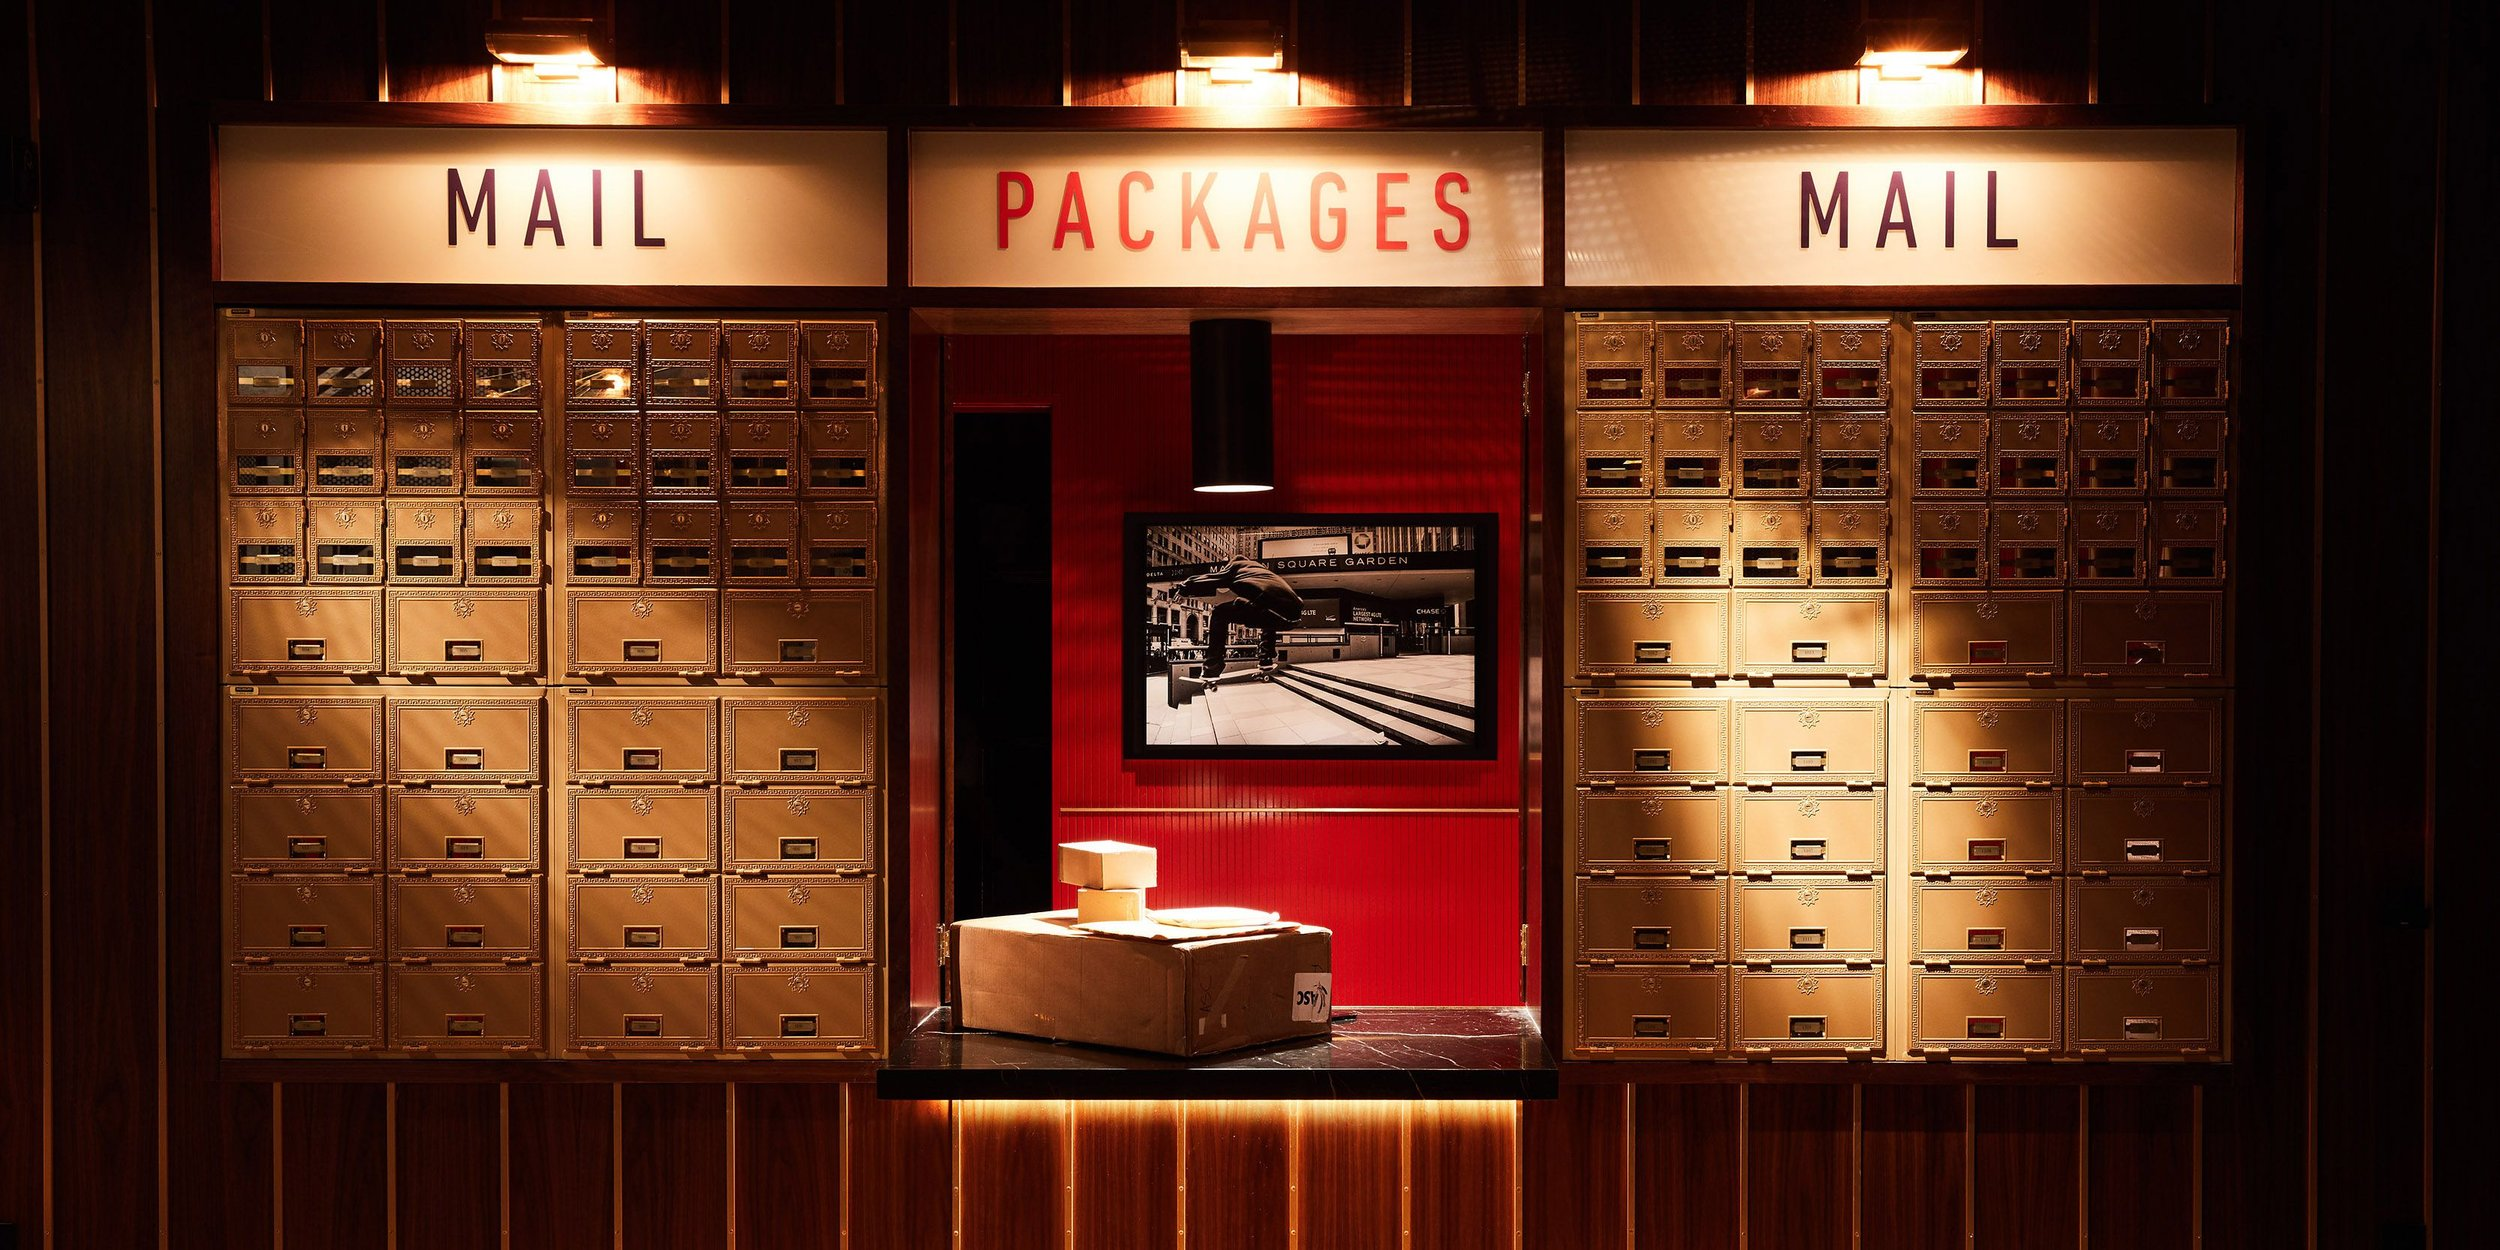 hbz-mailroom-nyc-05-1513114228.jpg